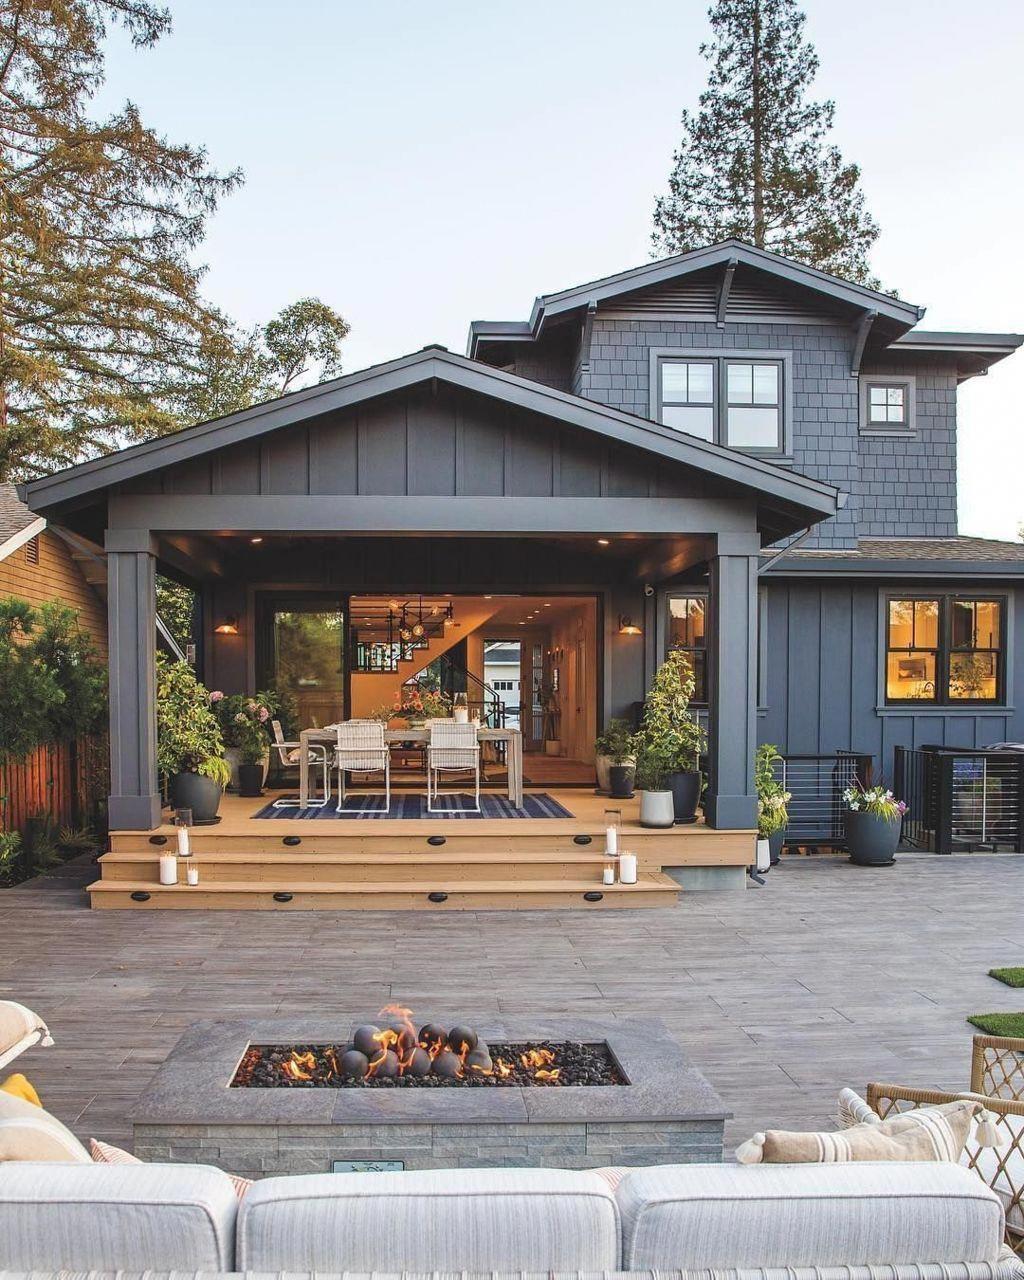 30 Back Porch Designs Perfect For Everything Shairoom Com Modern Farmhouse Exterior House Exterior Exterior House Colors Backyard porch ideas for houses